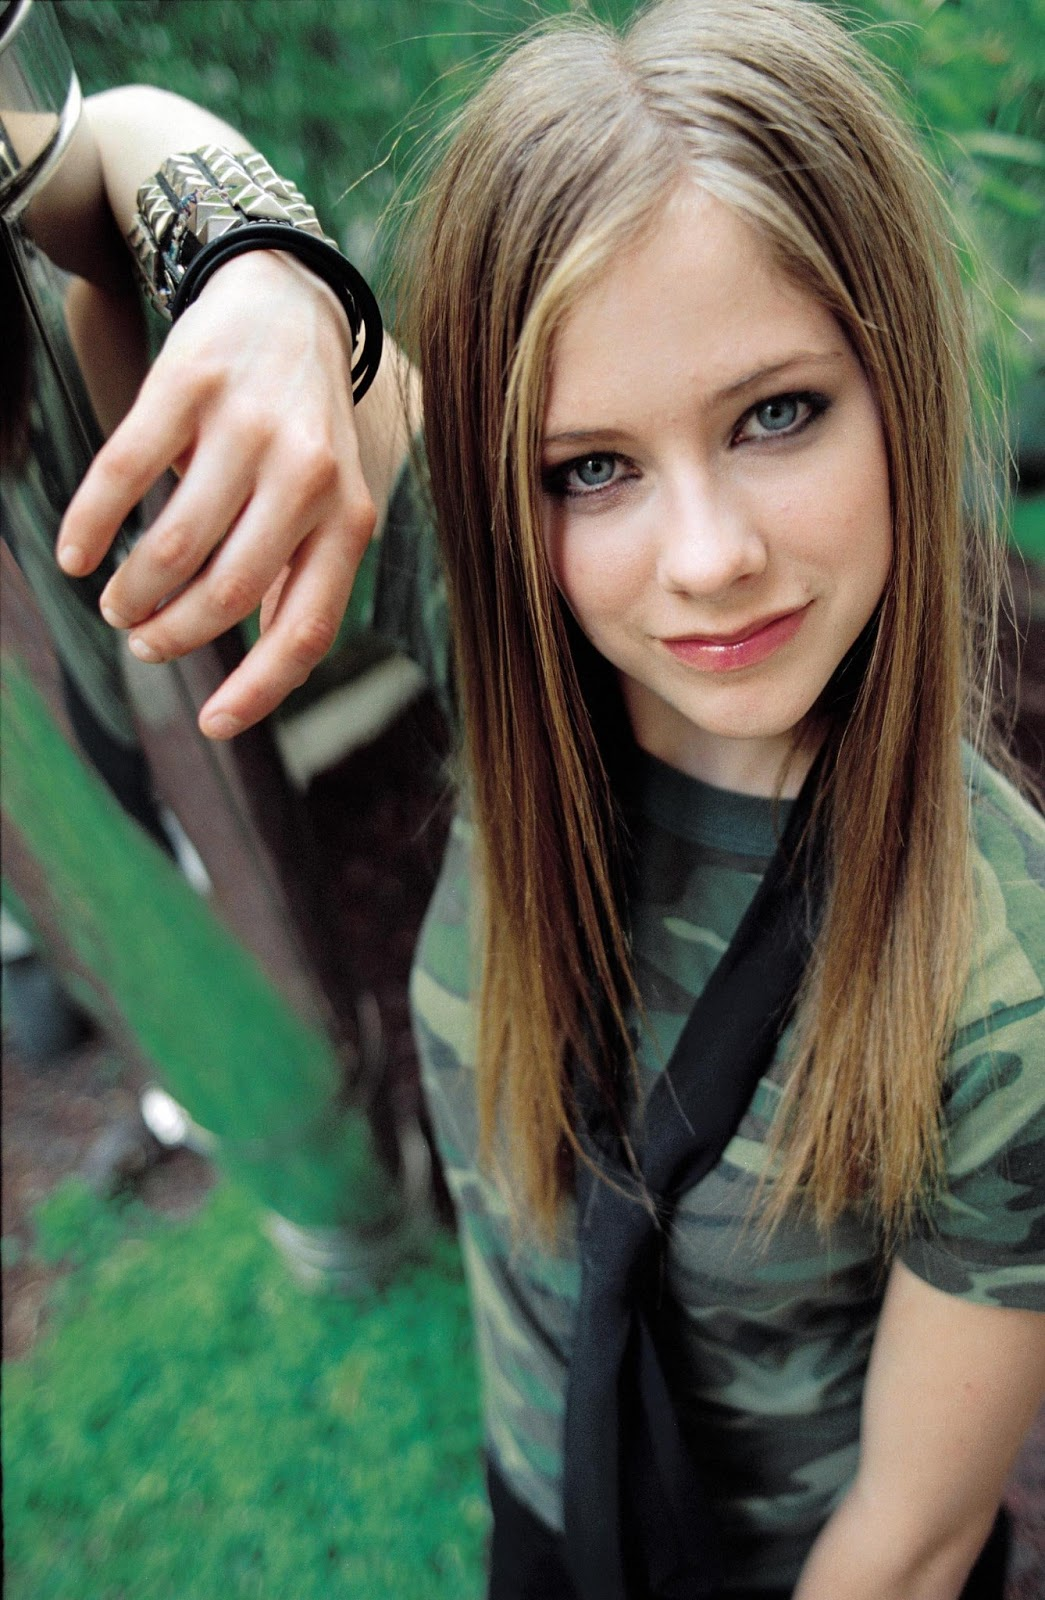 Avril Lavigne: Avril Lavigne photoshoot